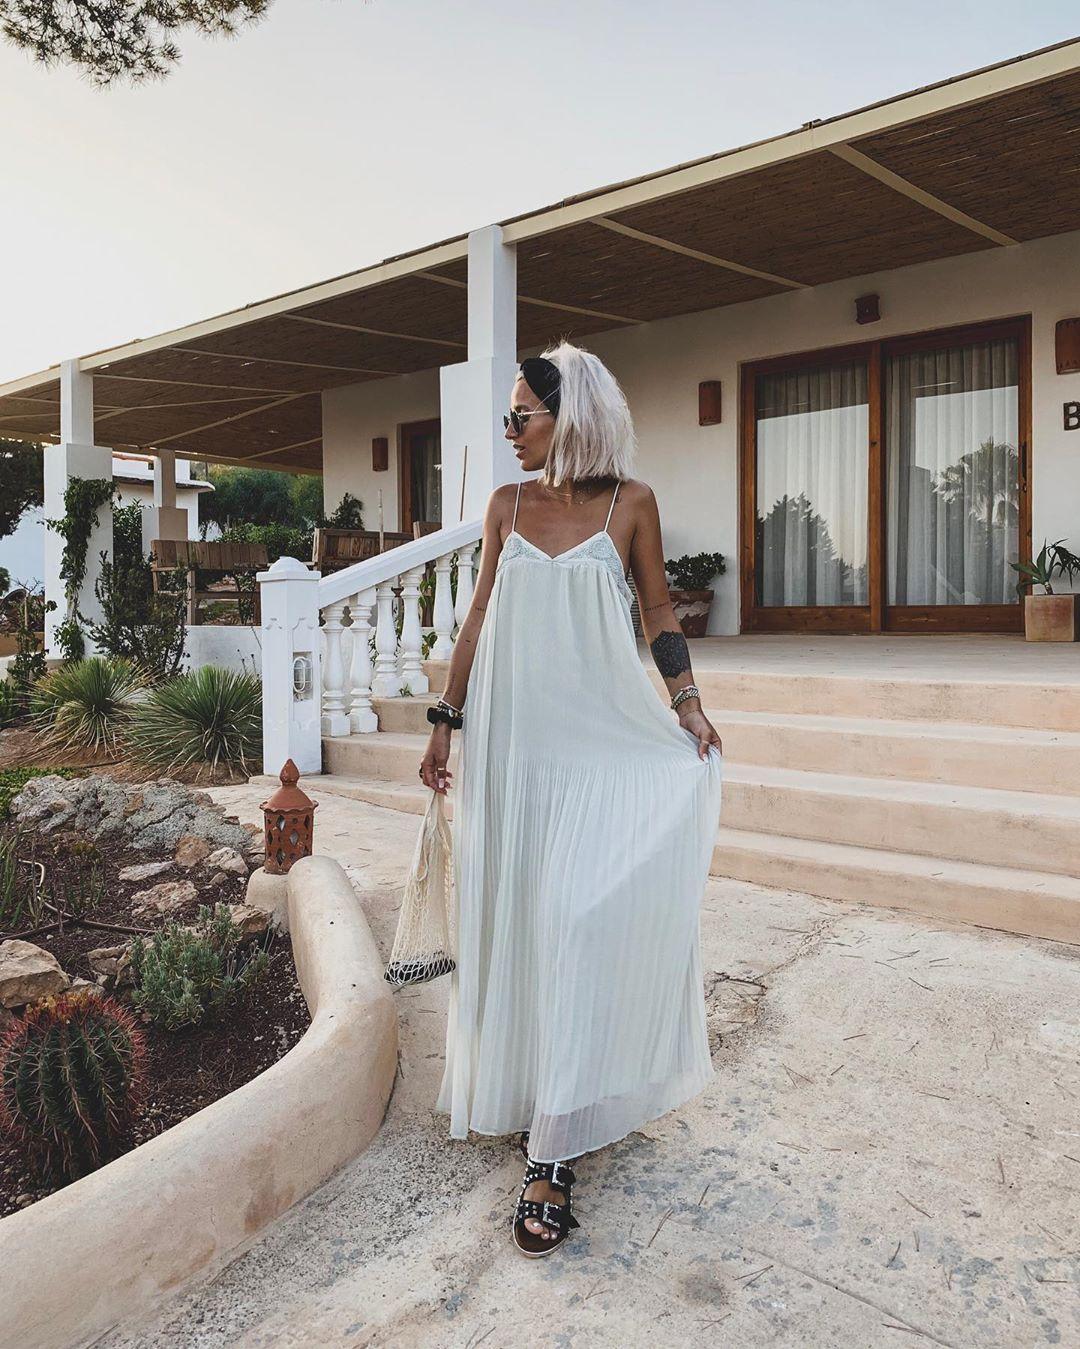 robe plissée de Zara sur noholita